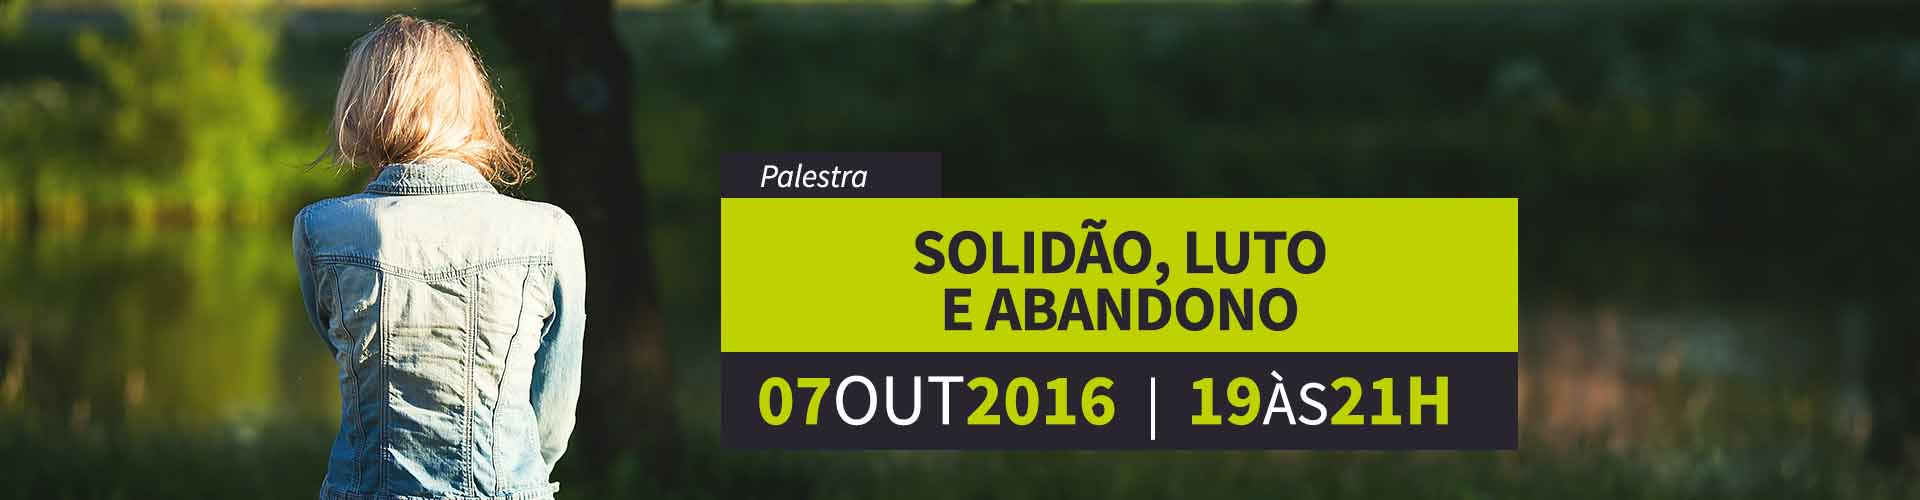 Palestra : Solidão, luto e abandono